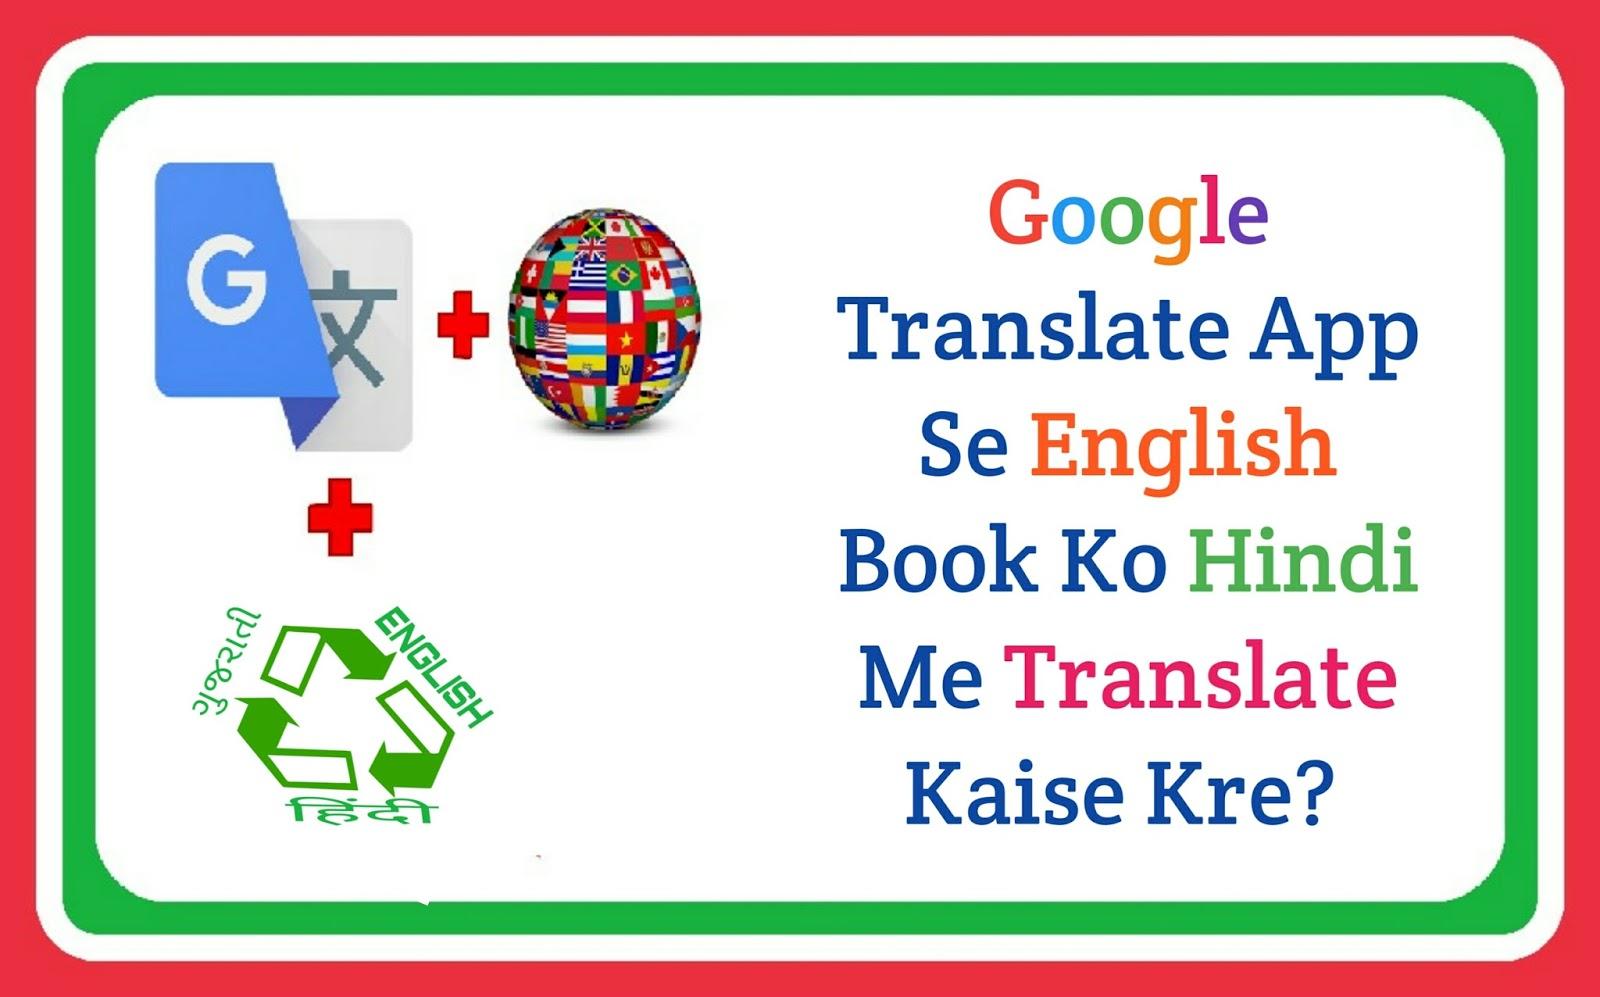 kisi english book ko hindi me live translate kaise kare